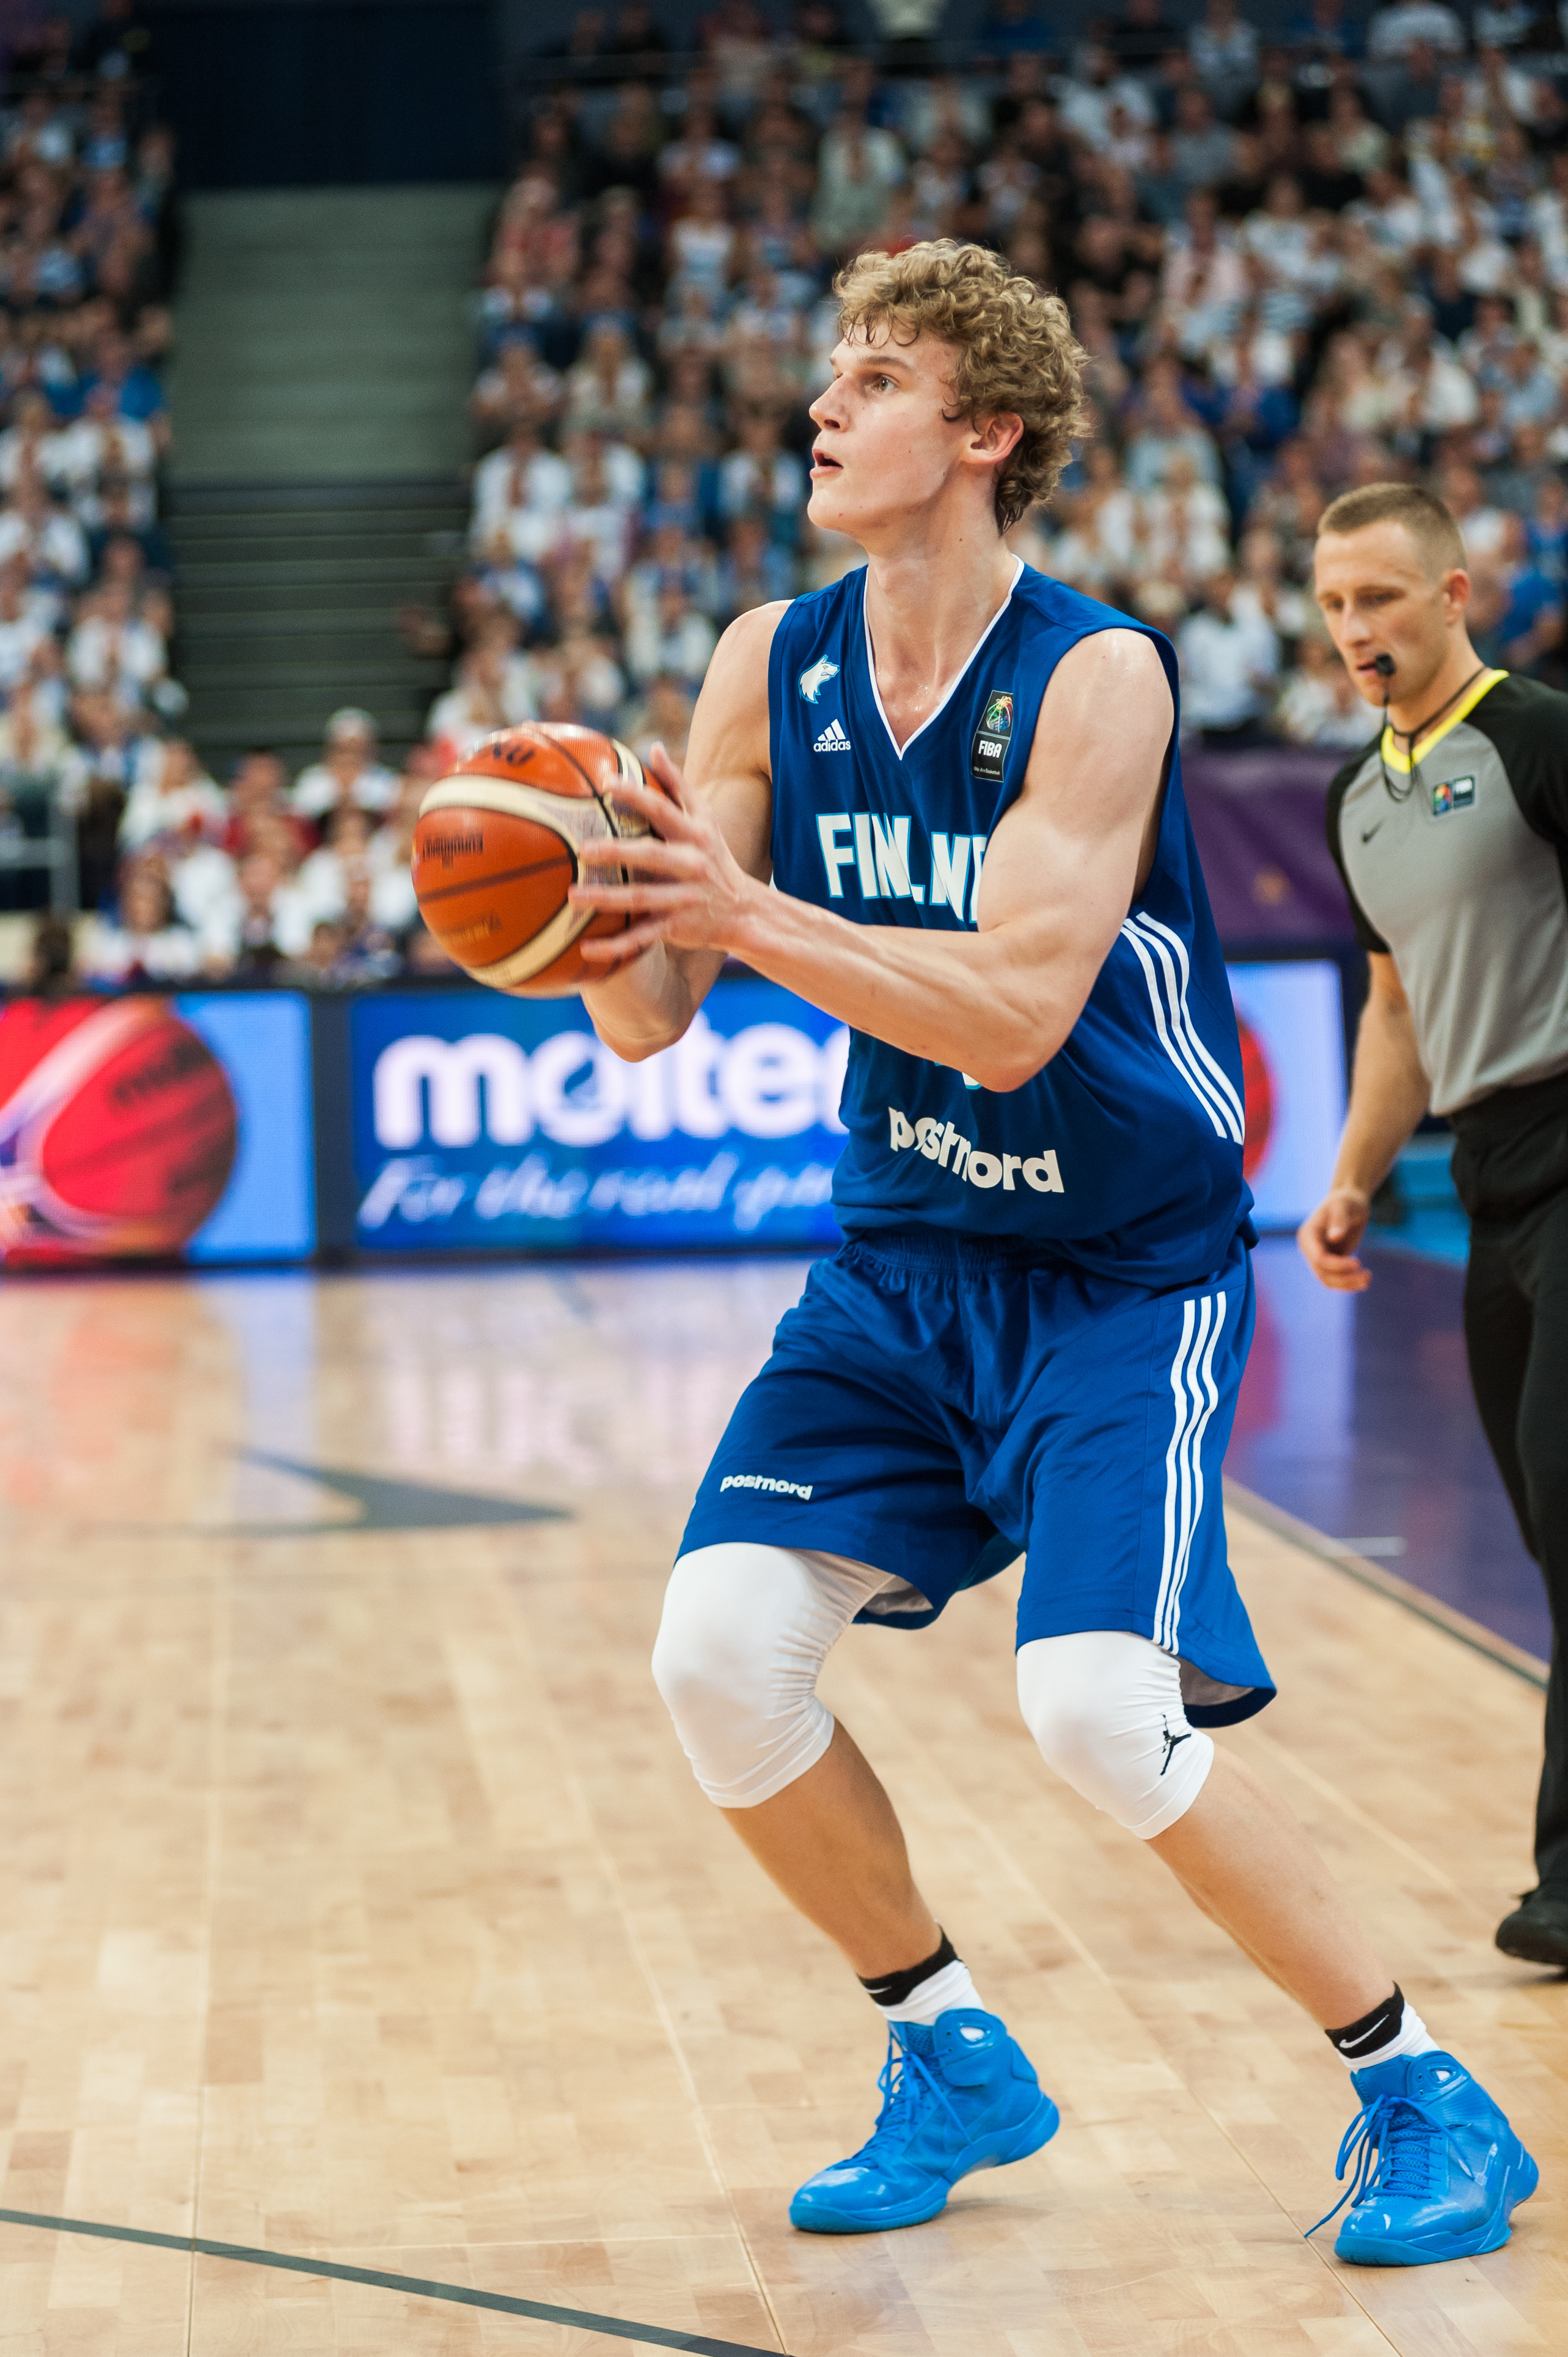 EuroBasket 2017 France vs Finland 01.jpg a8f608c17